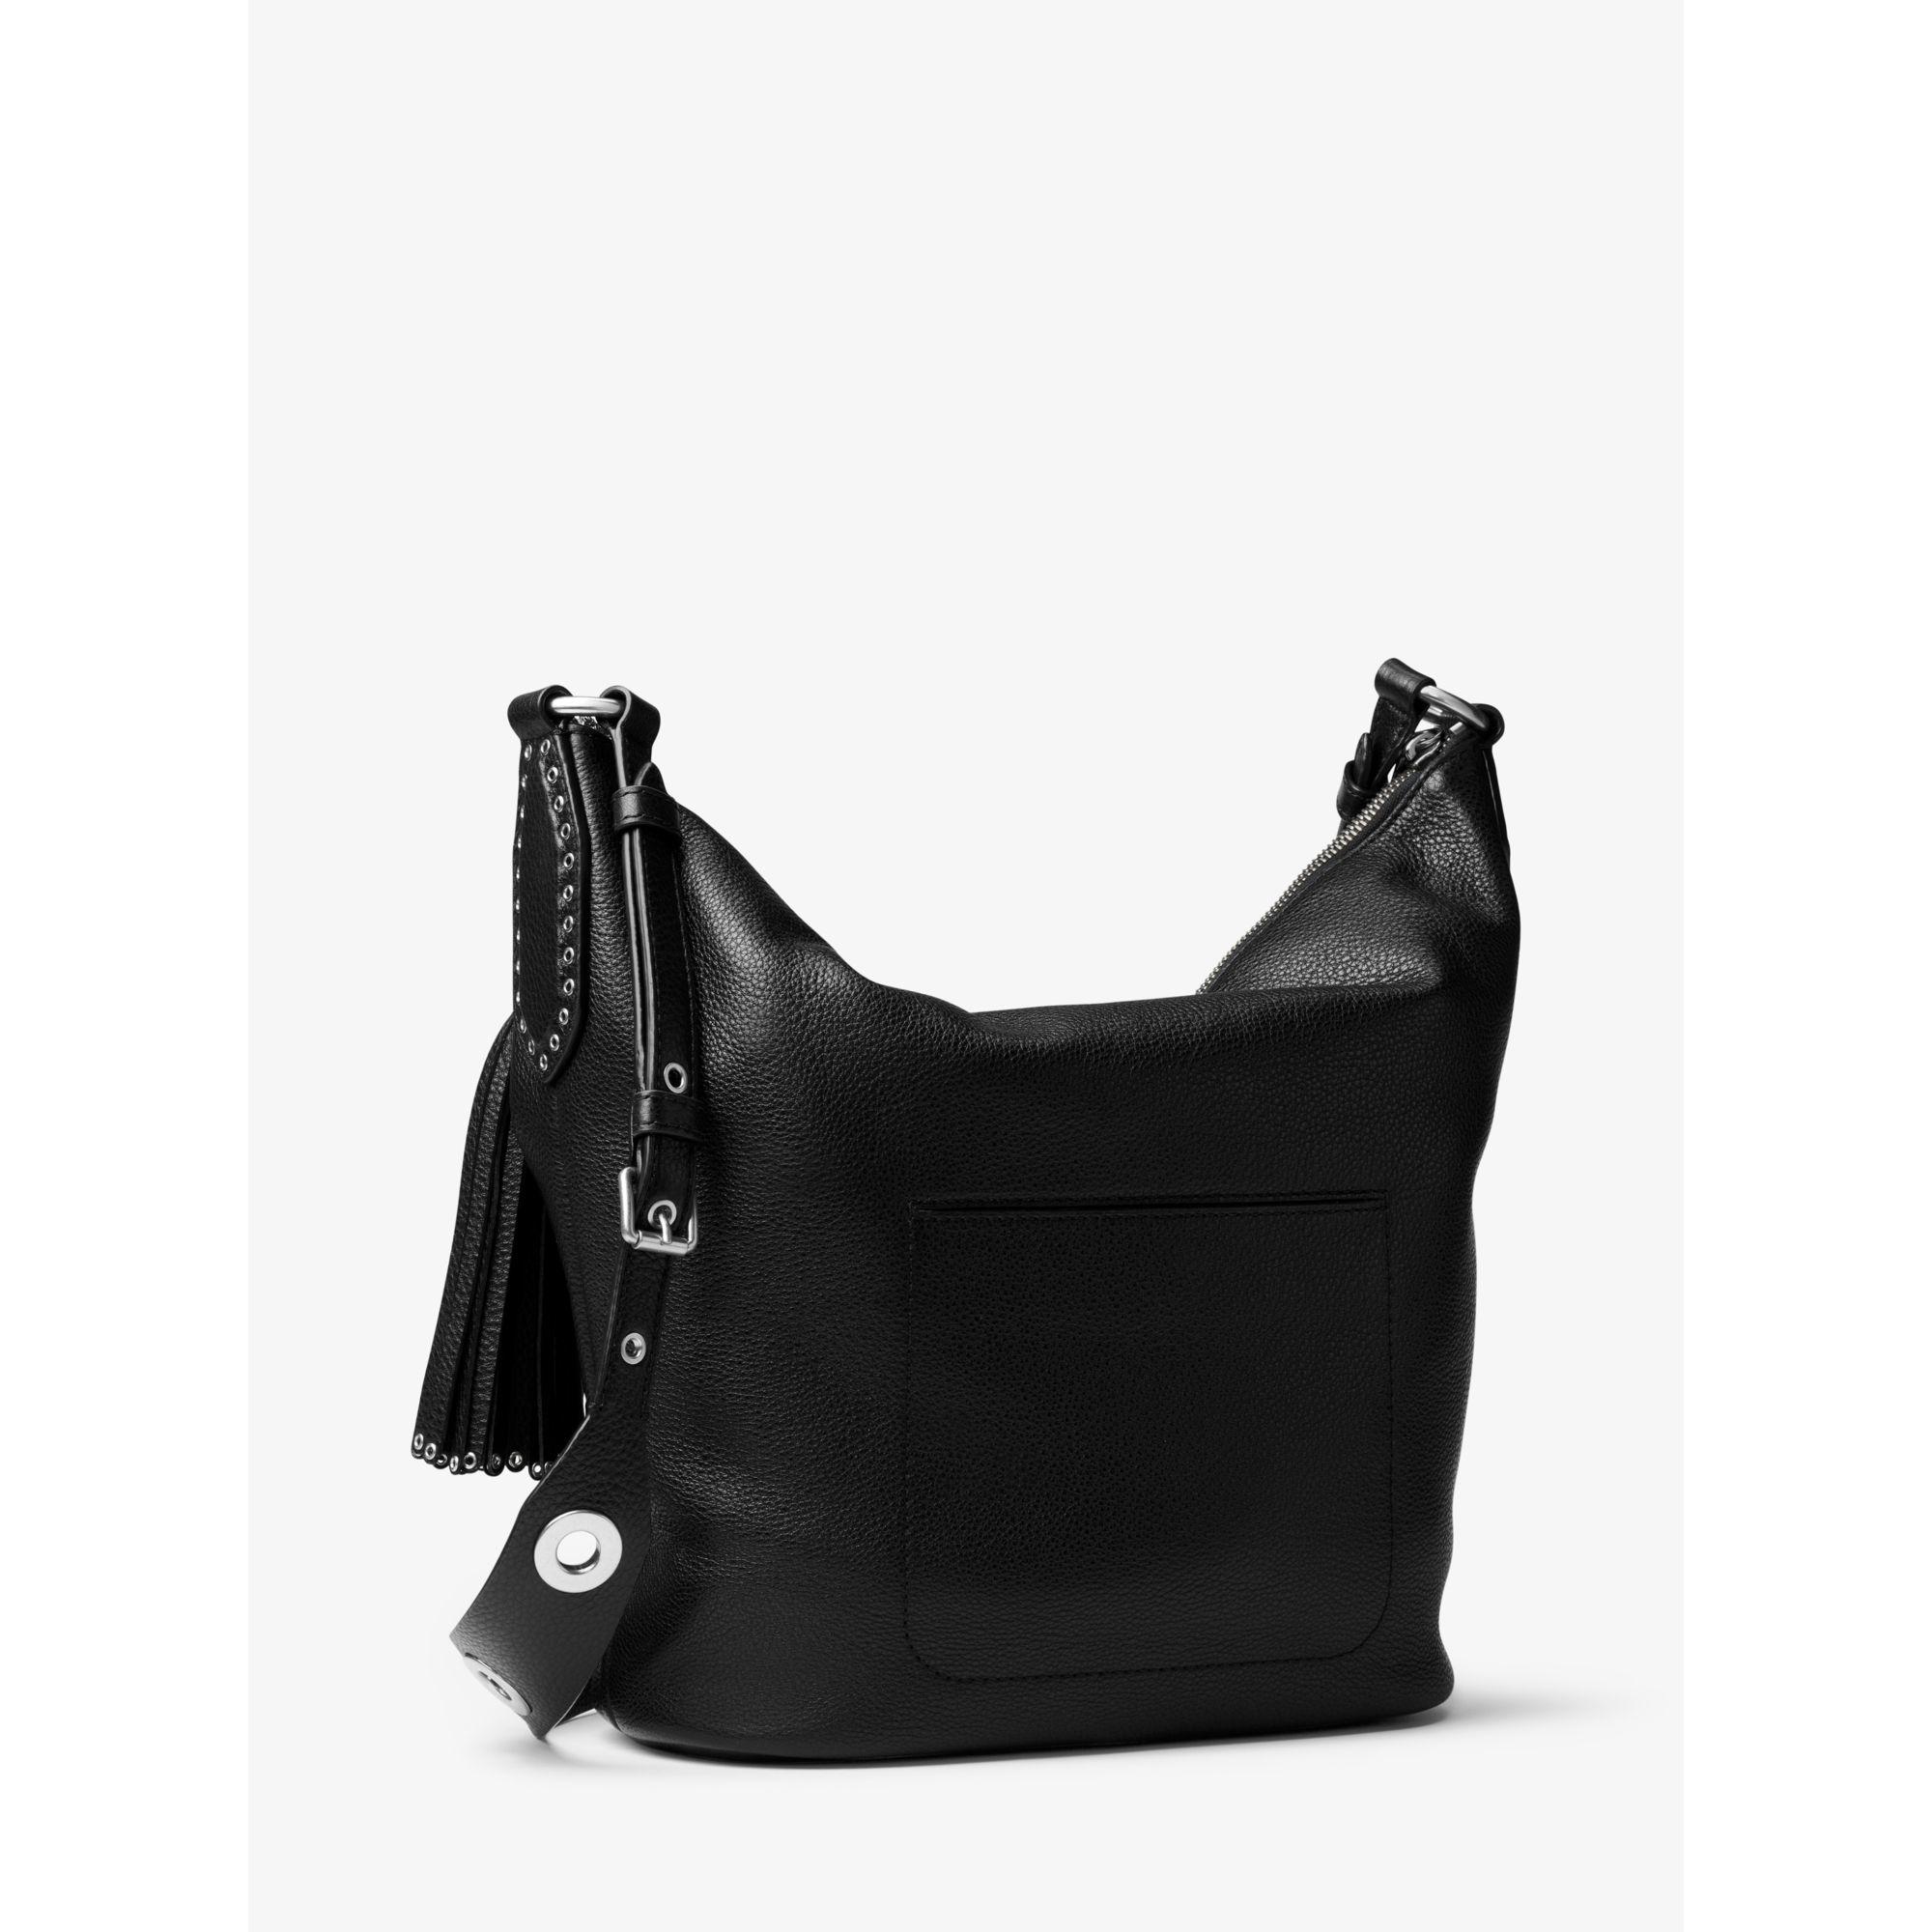 3dd9604e1bd5 Lyst - Michael Kors Brooklyn Large Leather Feed Bag in Black